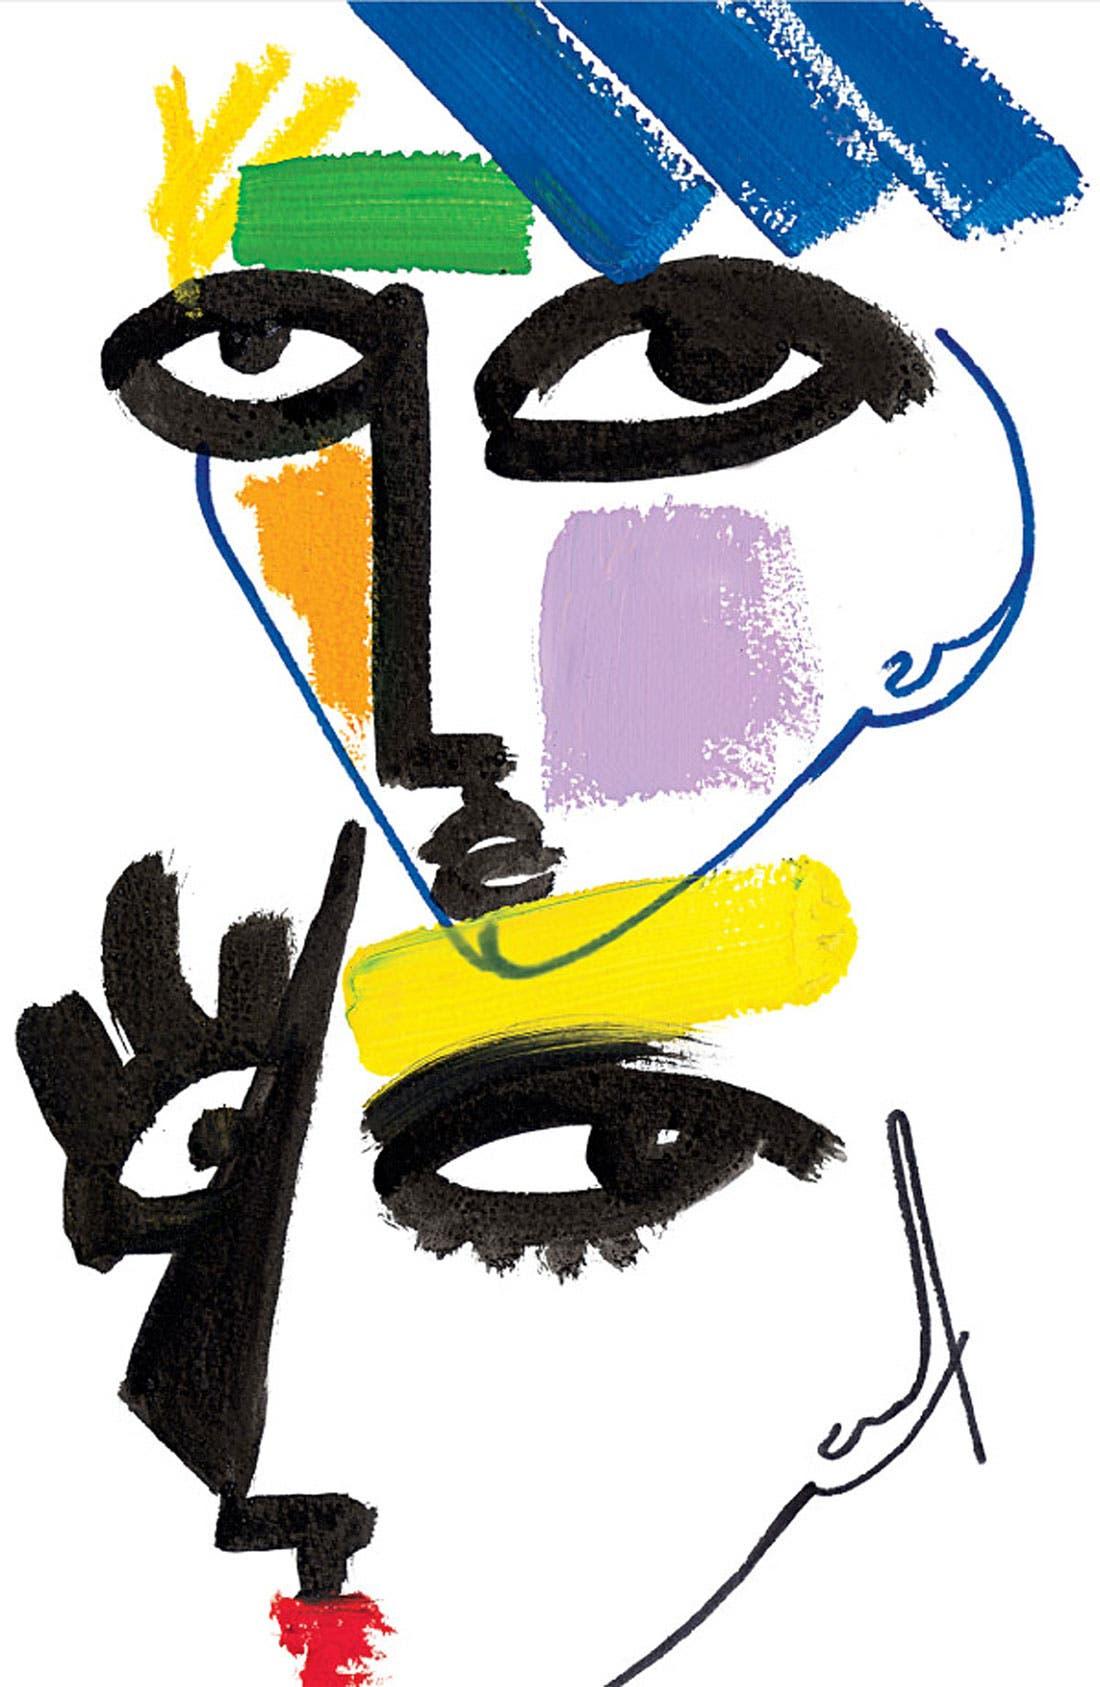 M·A·C 'Illustrated - Red x3' Lip Color & Bag by Julie Verhoeven,                             Alternate thumbnail 2, color,                             000